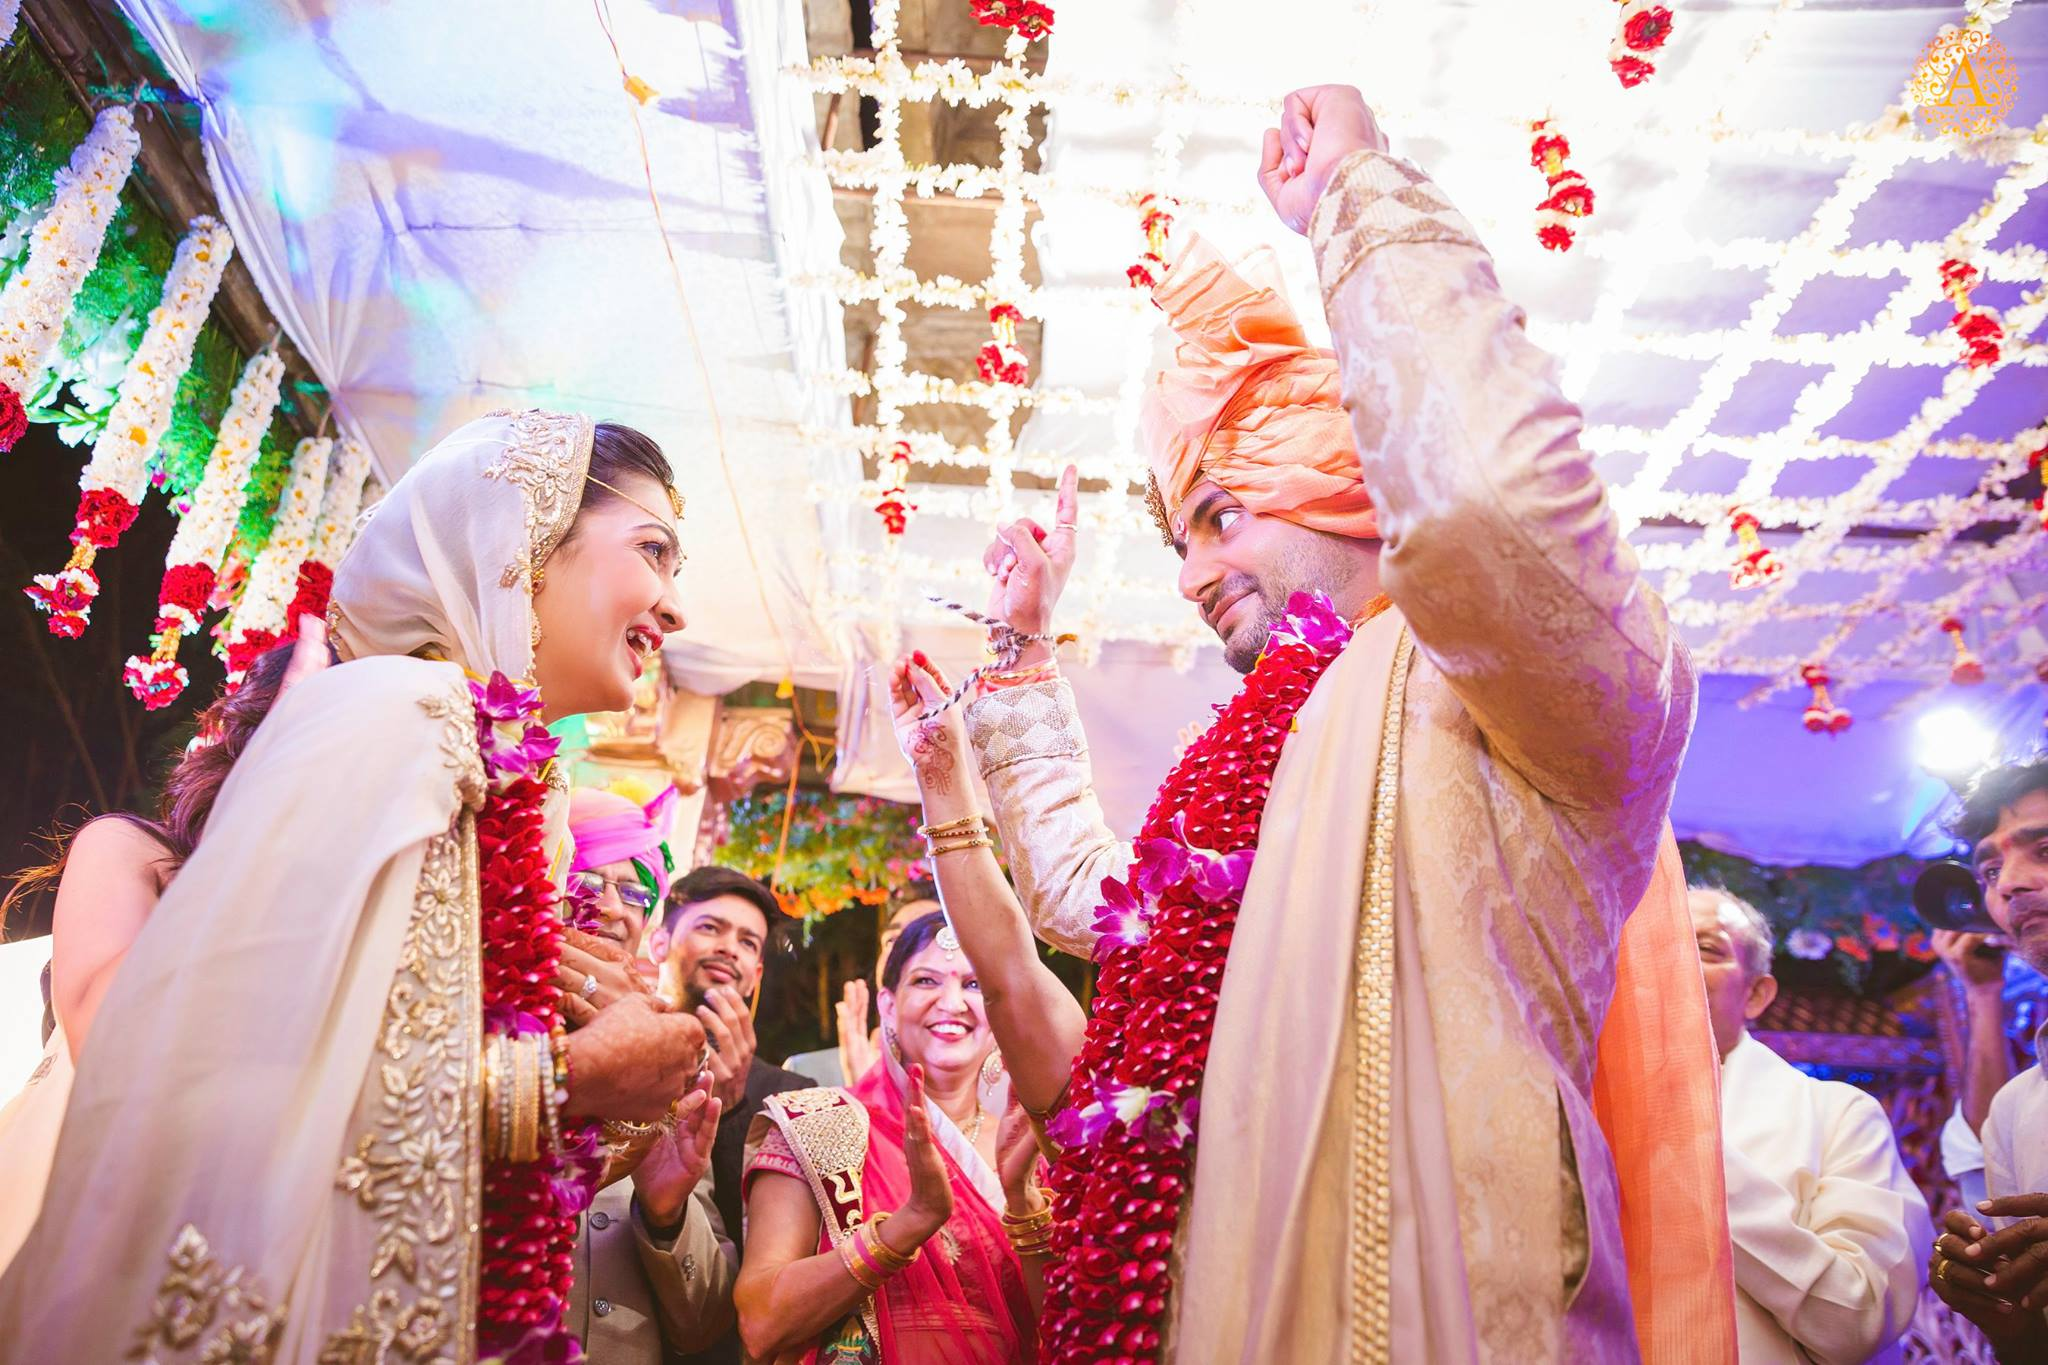 North Indian wedding rituals and ceremonmoneys